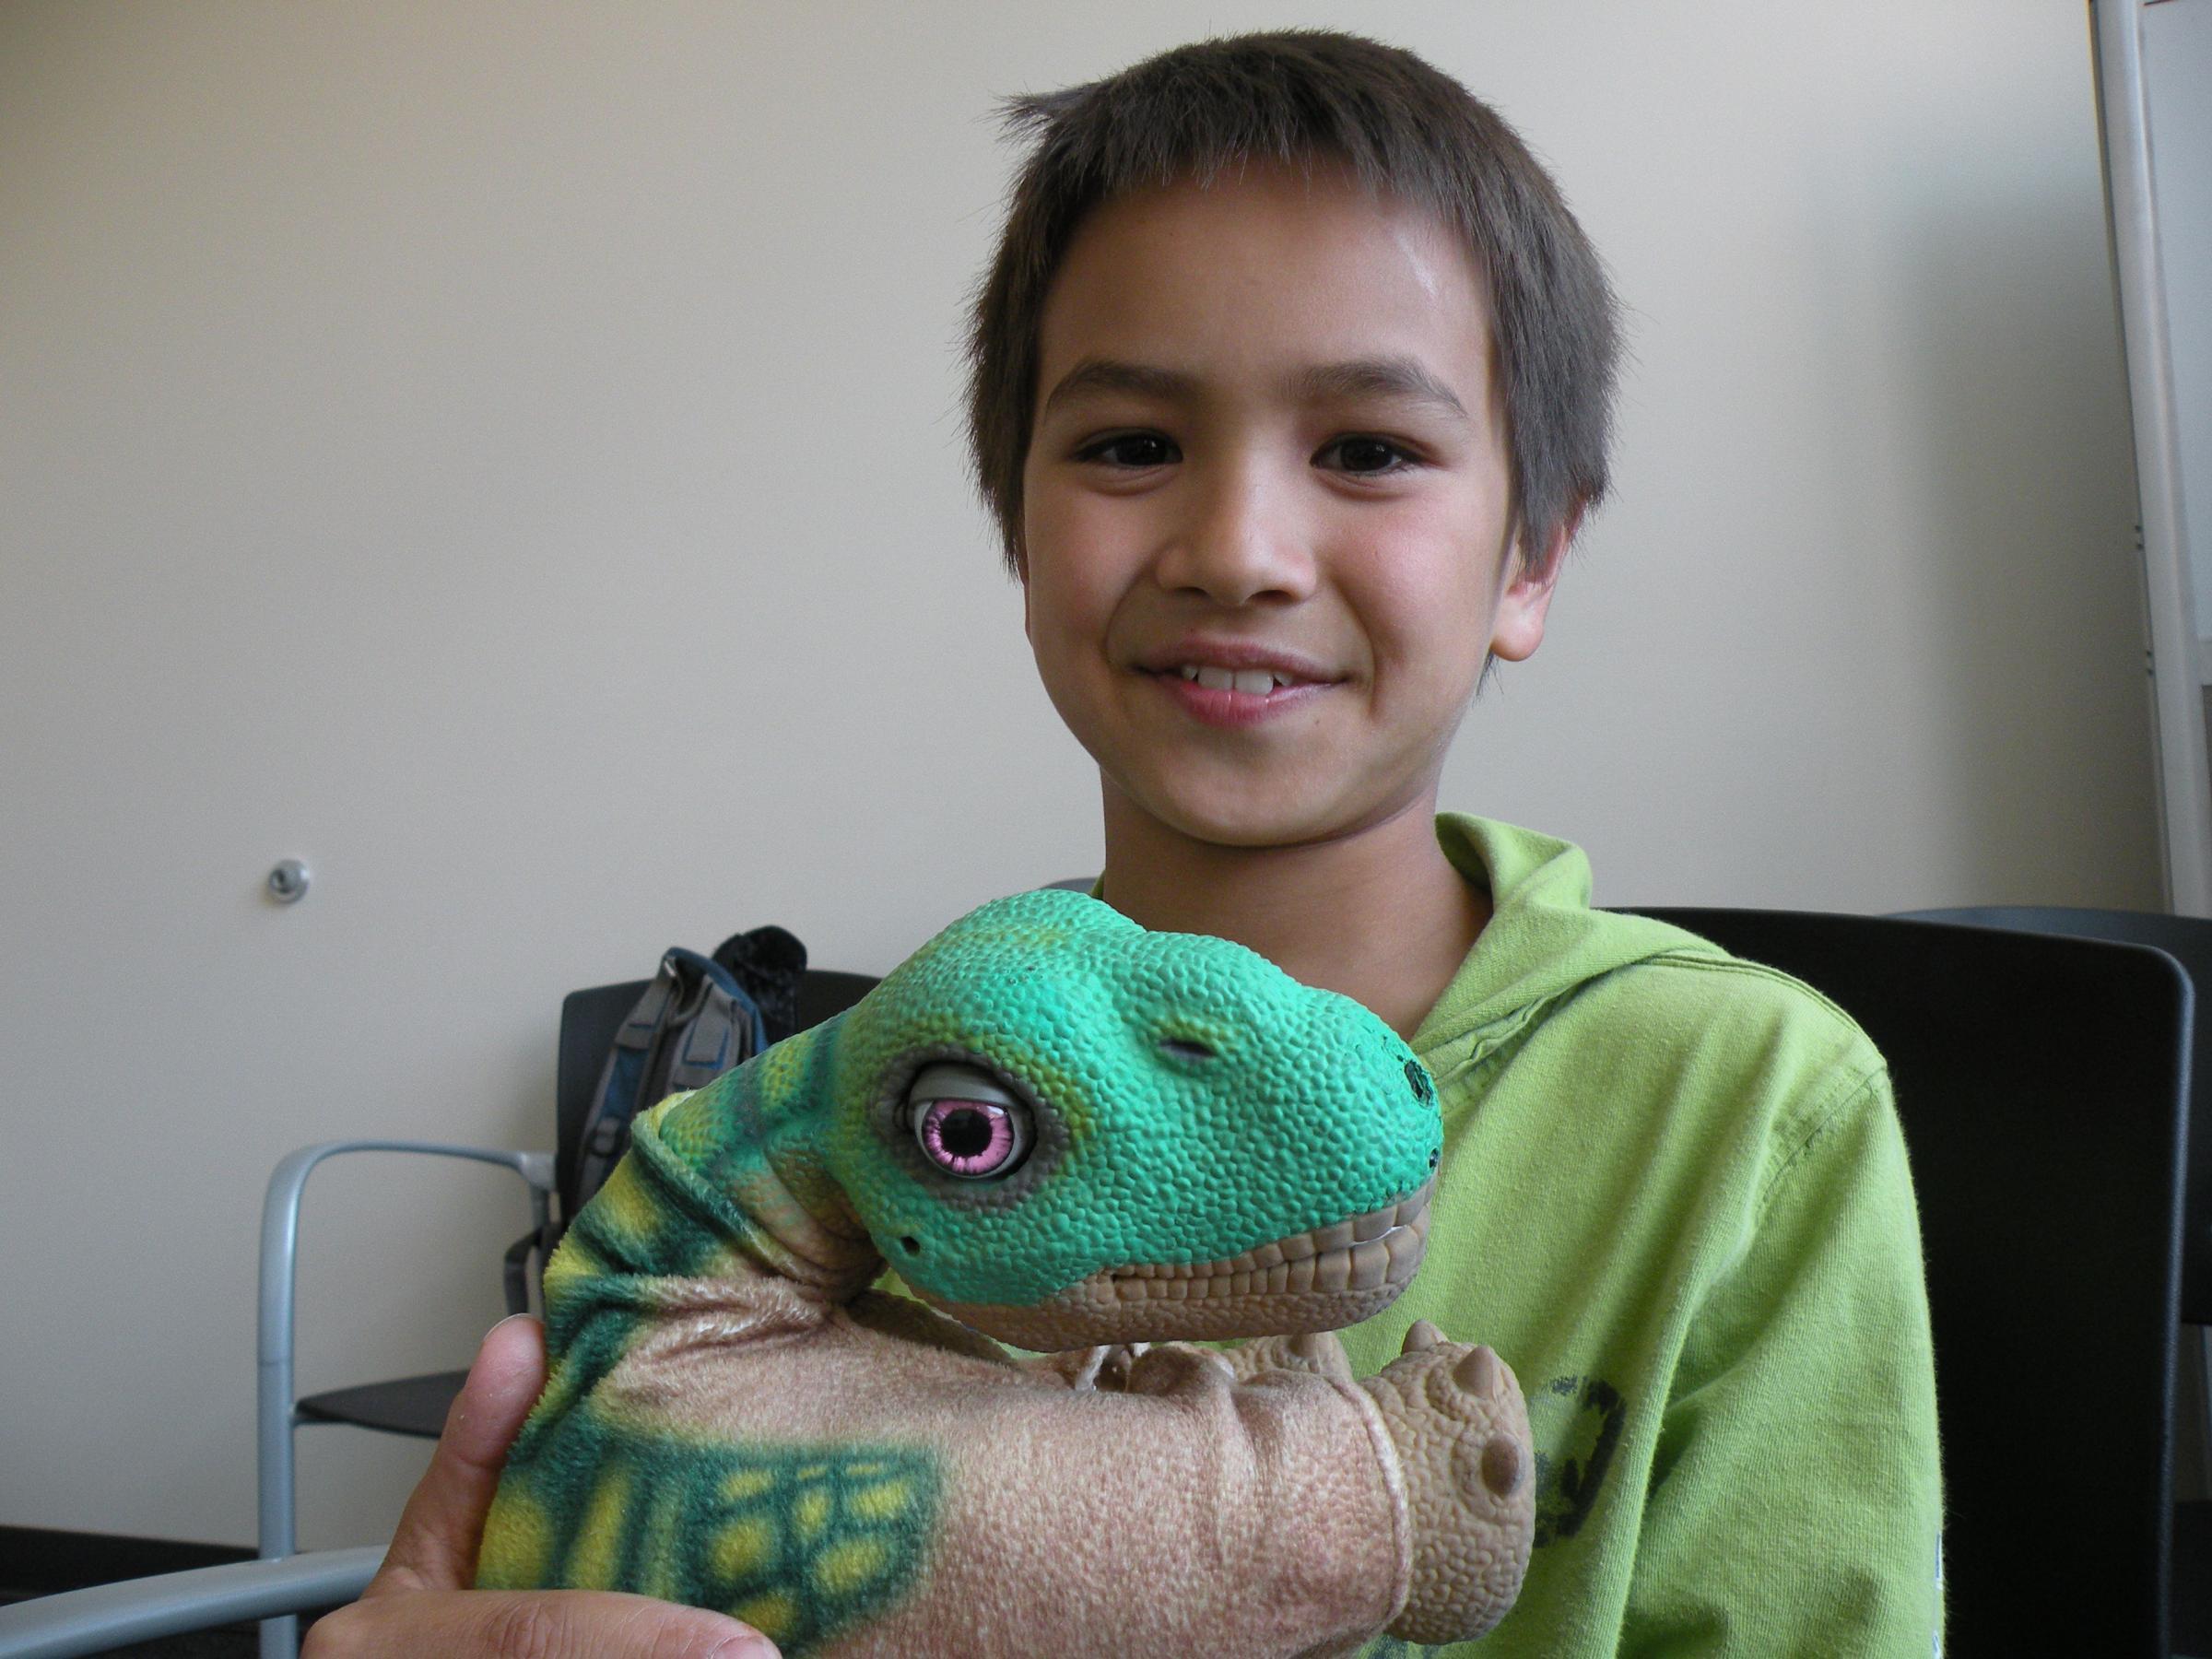 pet lizards for kids фото база